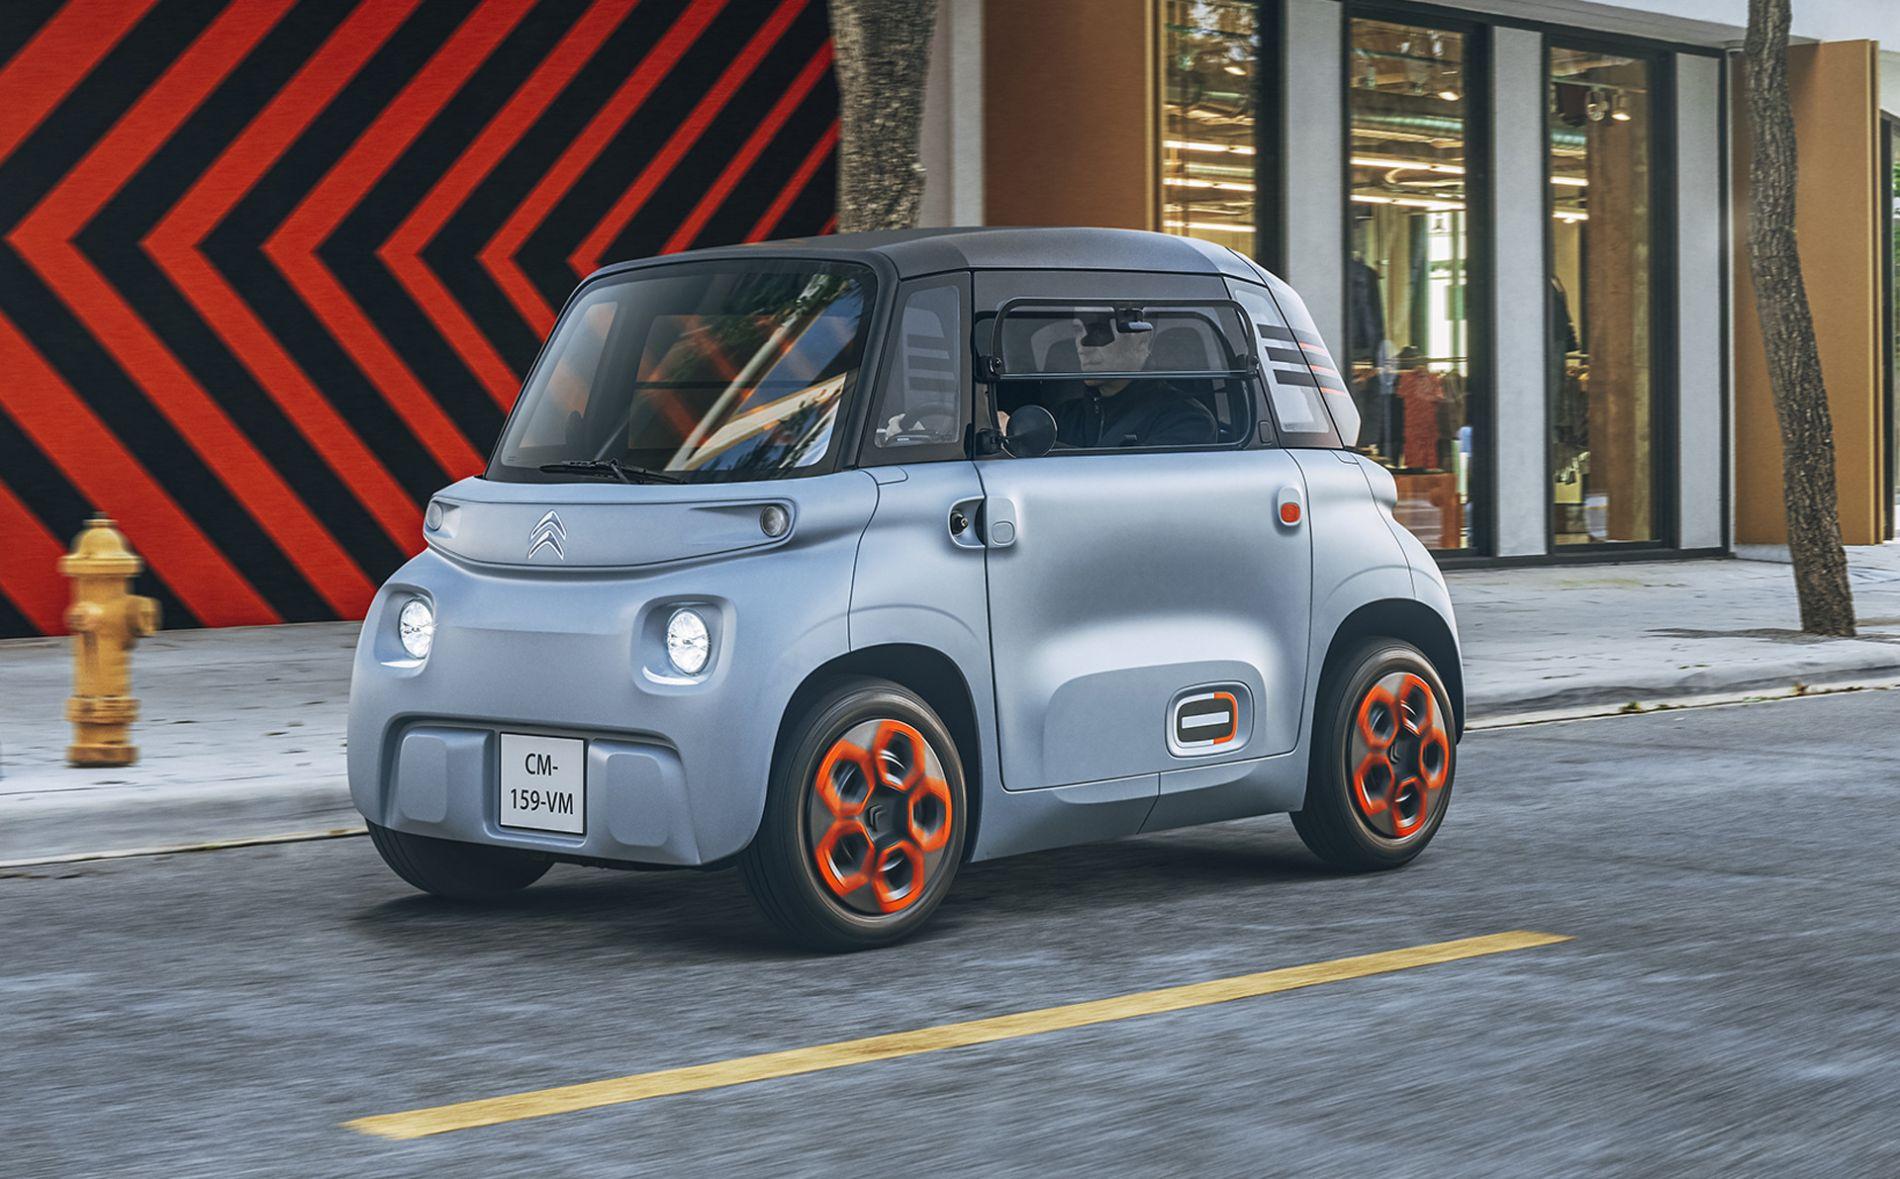 2021 Citroen Ami - მომავლის ტრანსპორტი